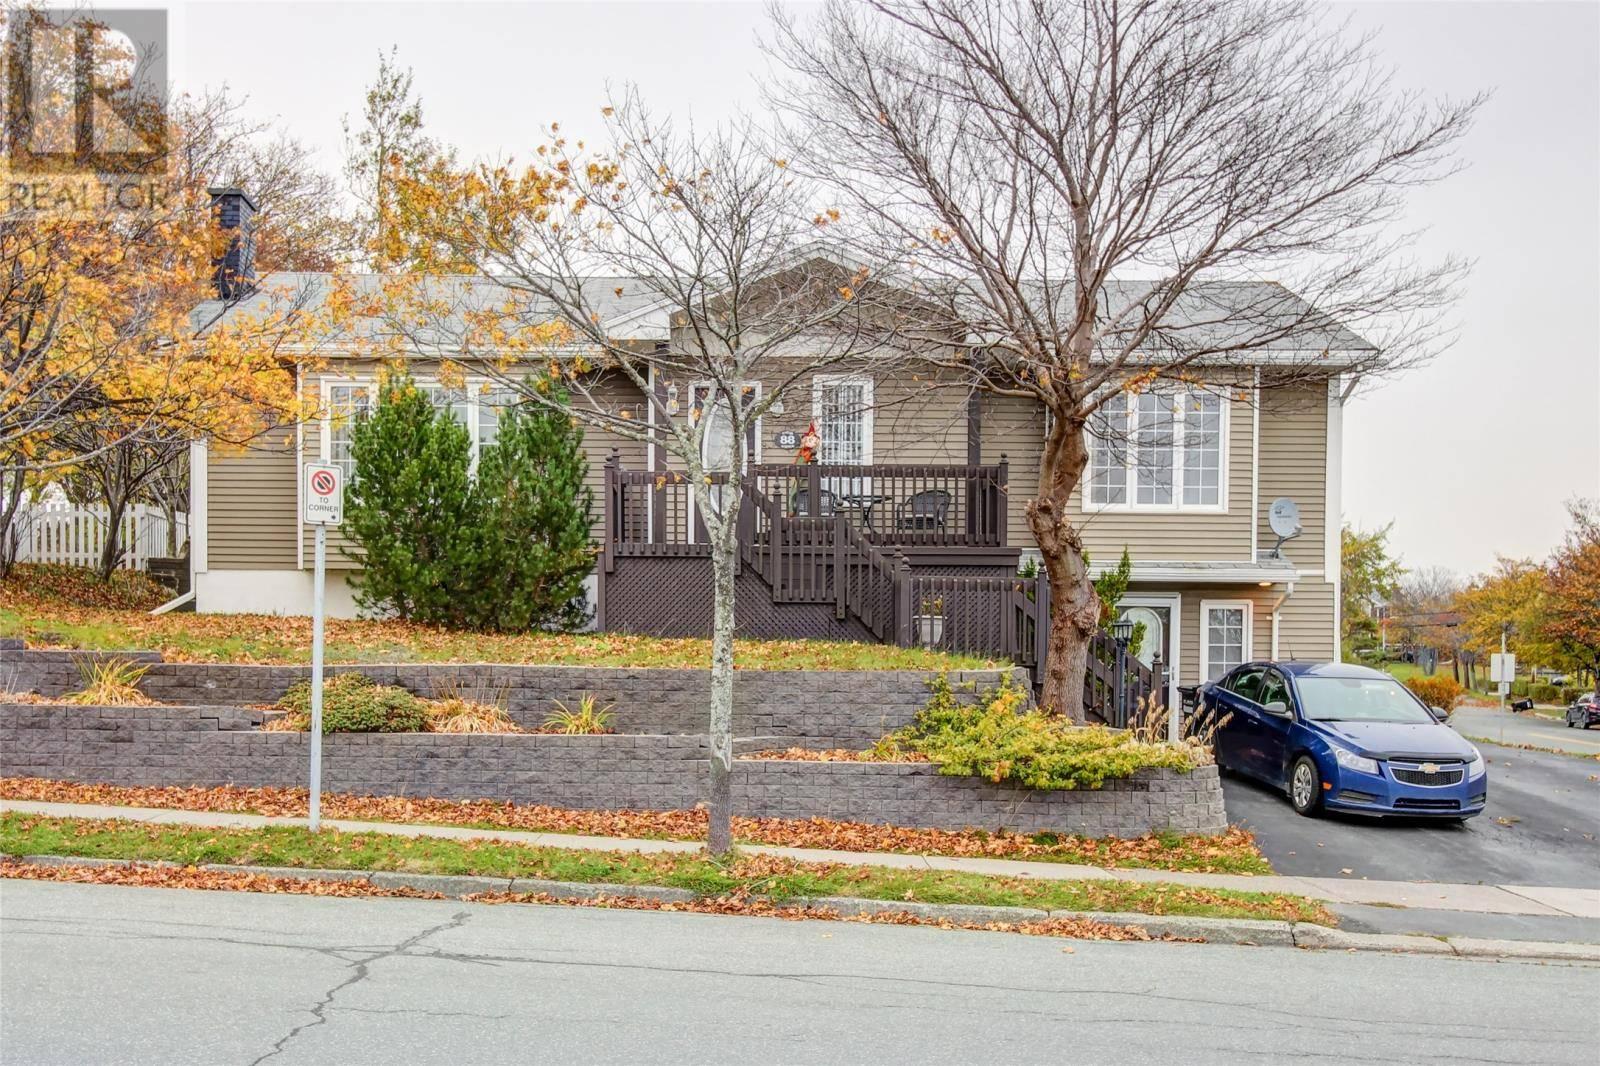 House for sale at 88 Ennis Ave St. John's Newfoundland - MLS: 1207695